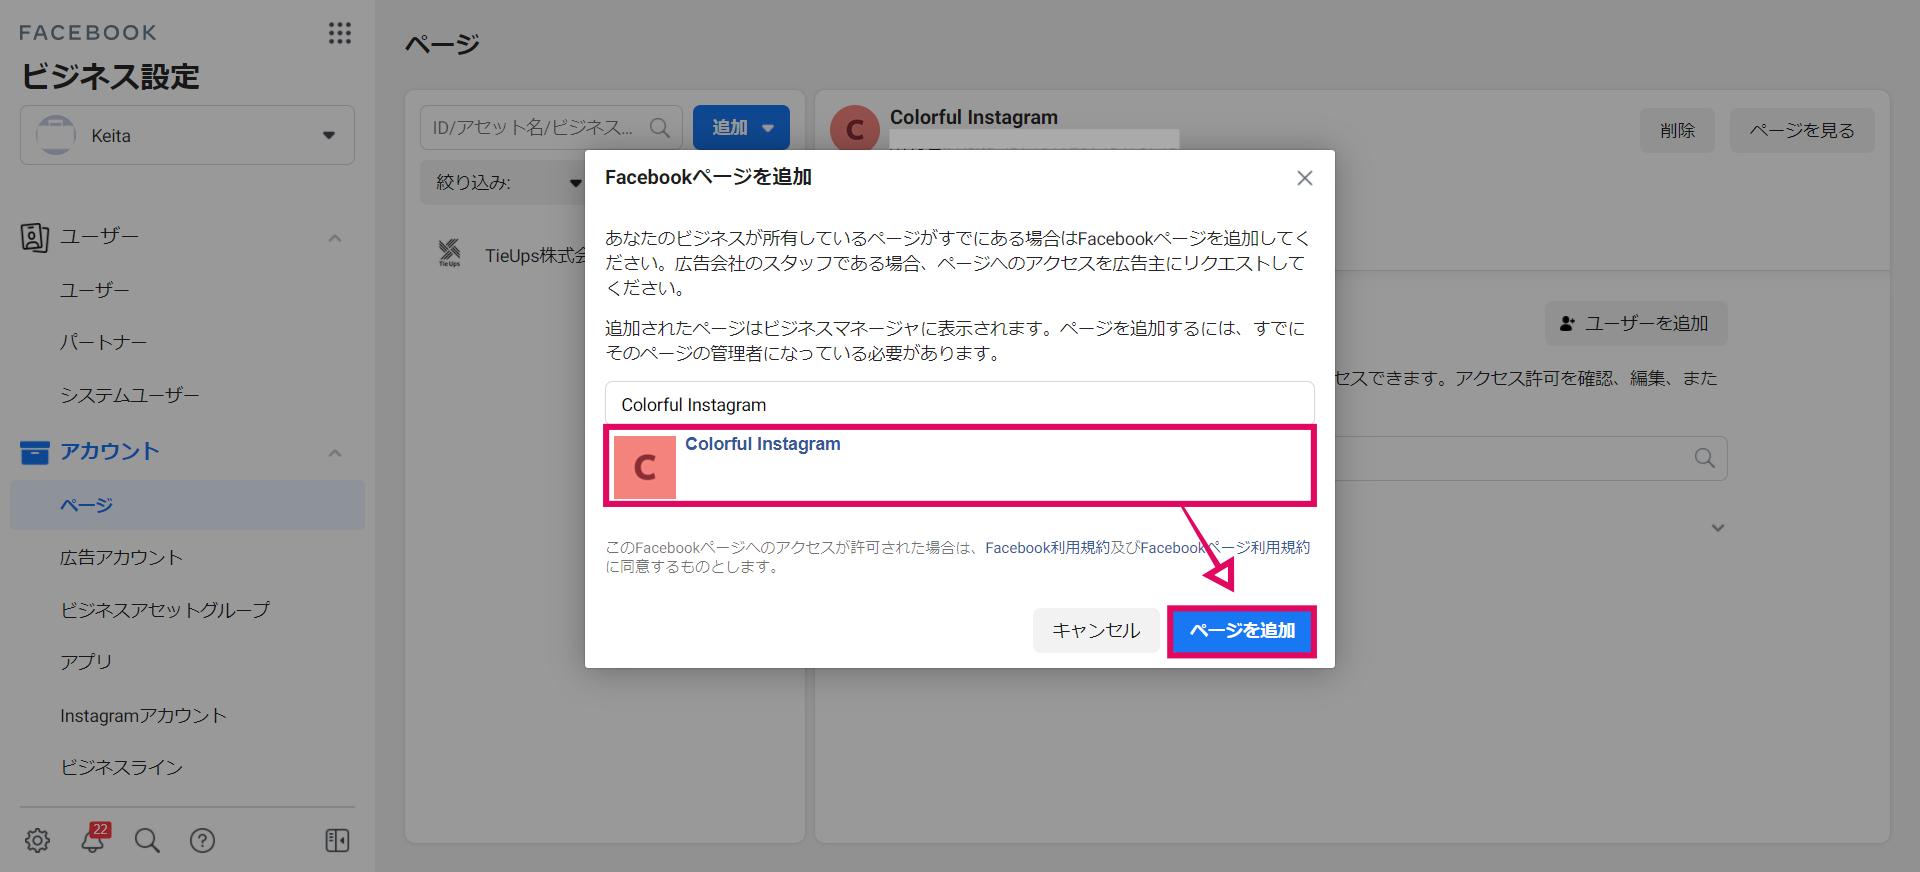 Facebookページ追加の画面